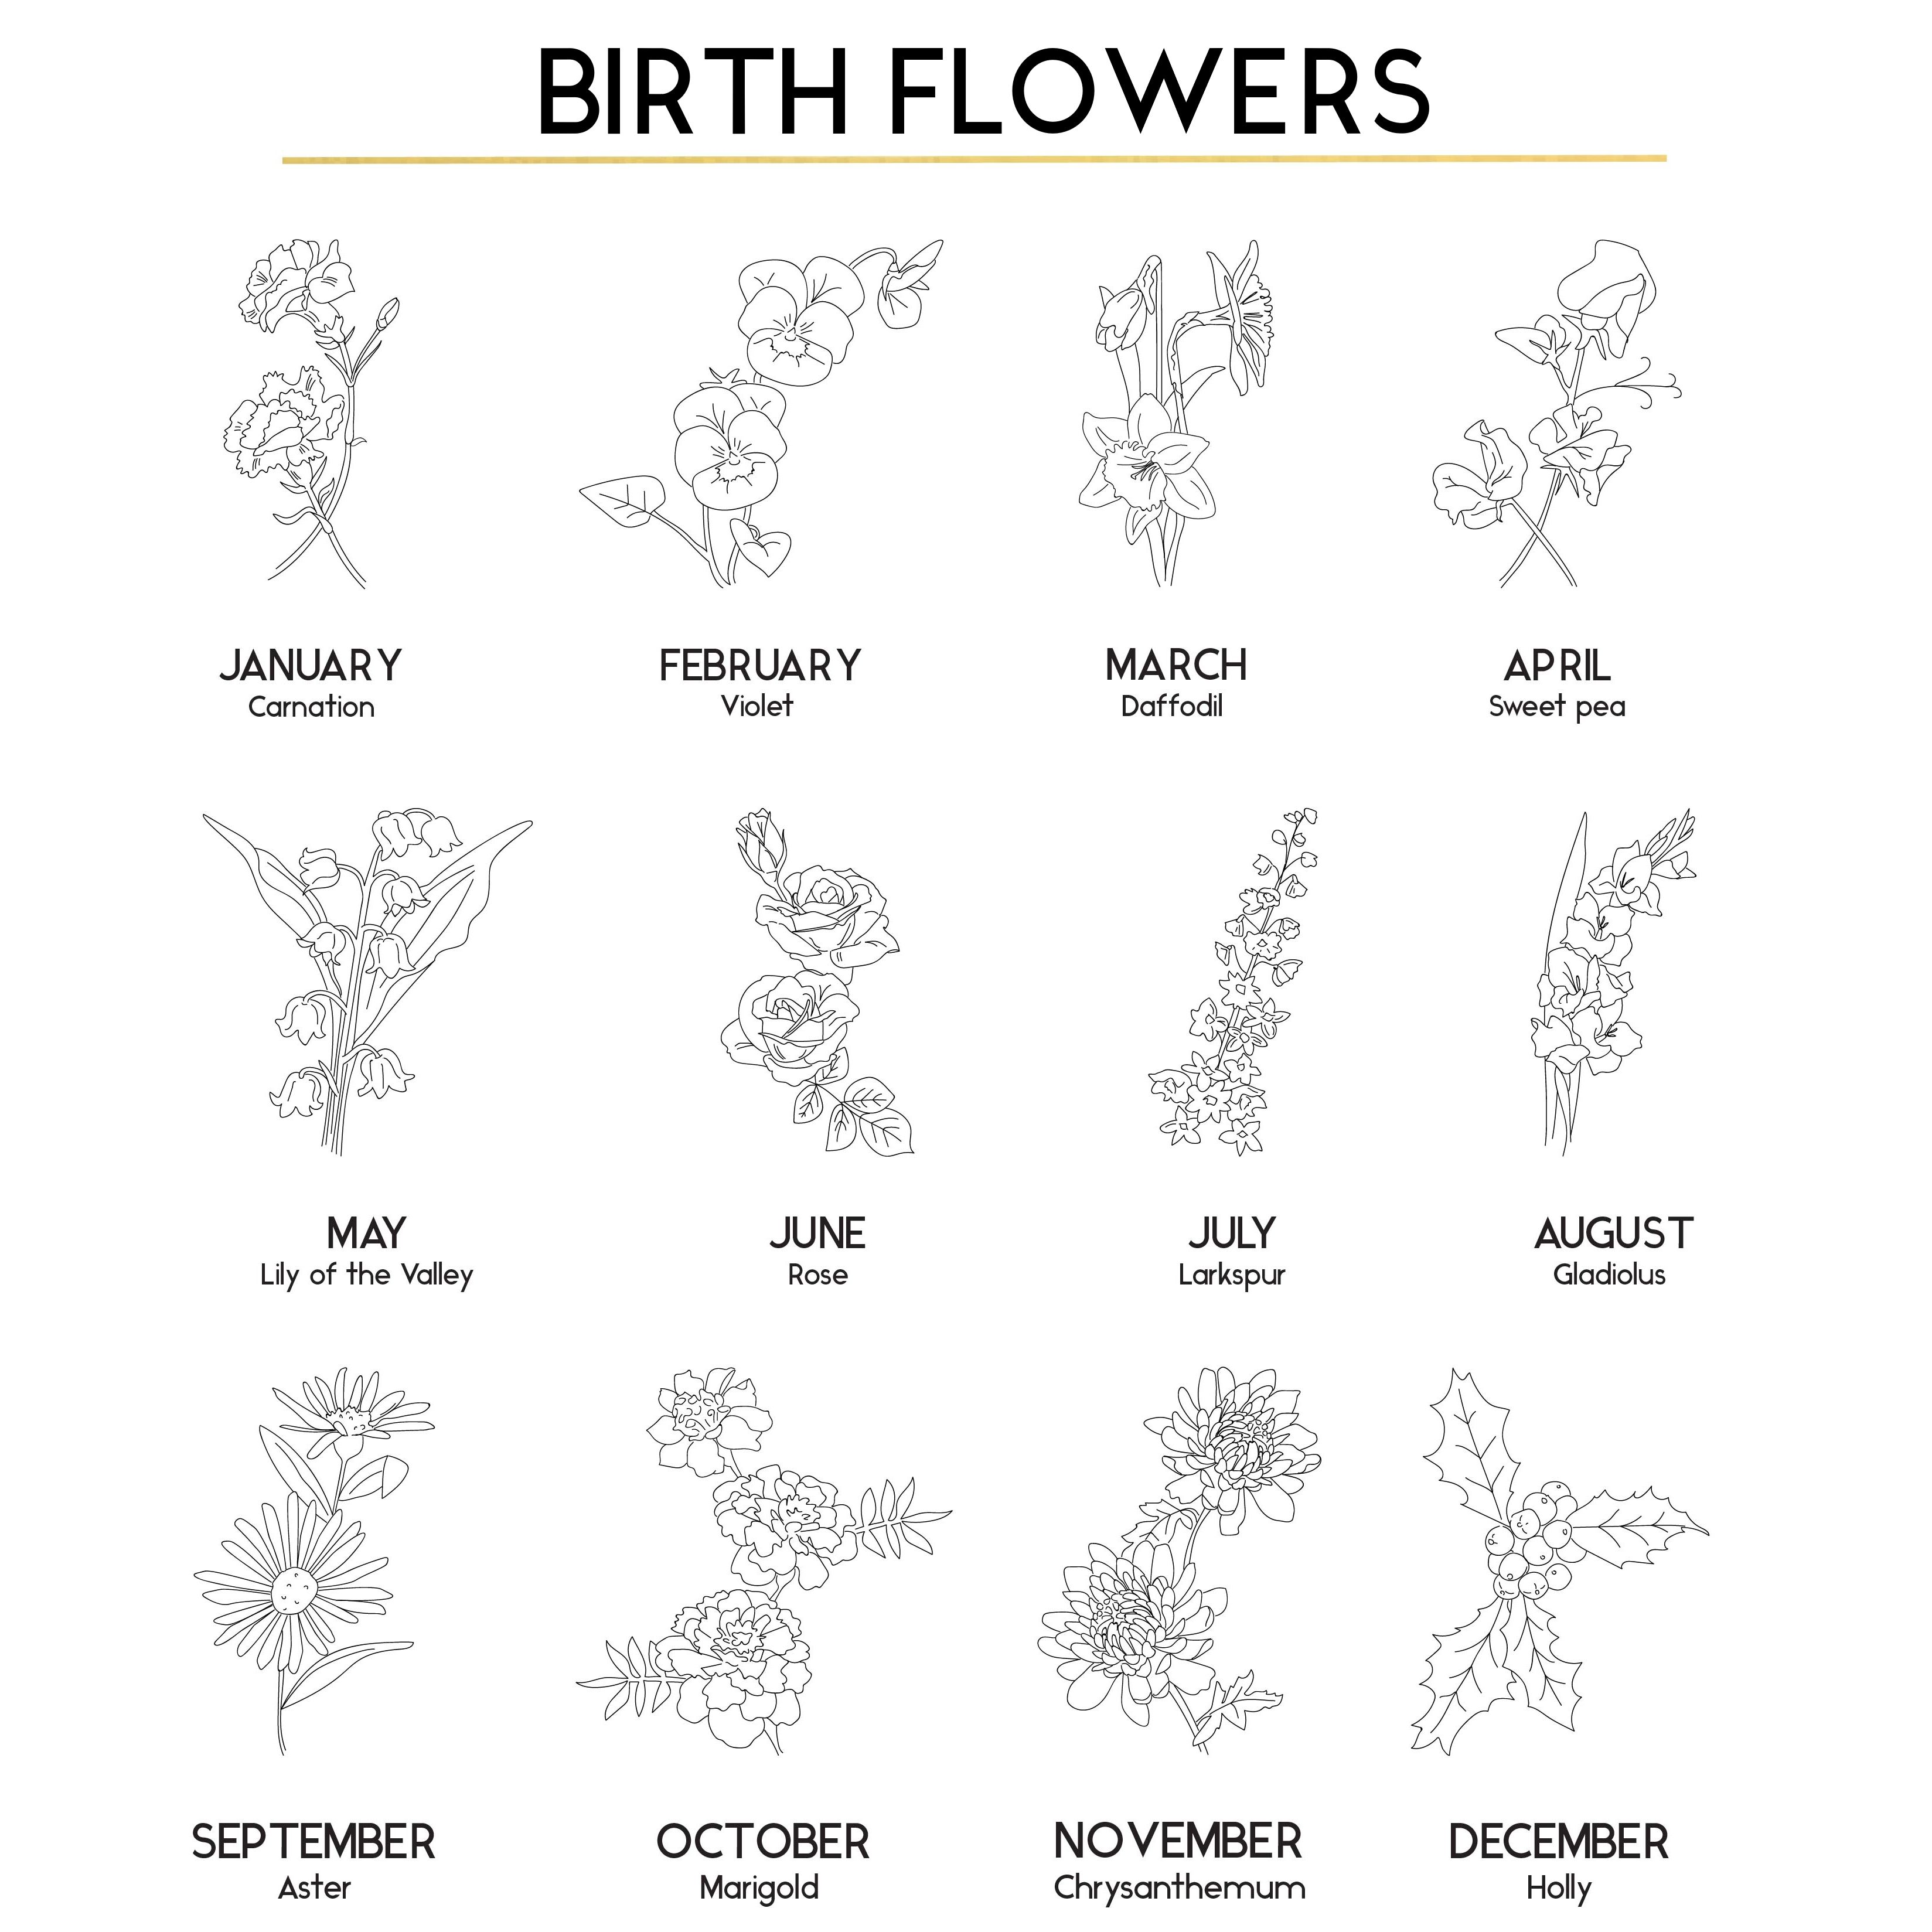 Personalised Couples Birth Flower Trinket Dish